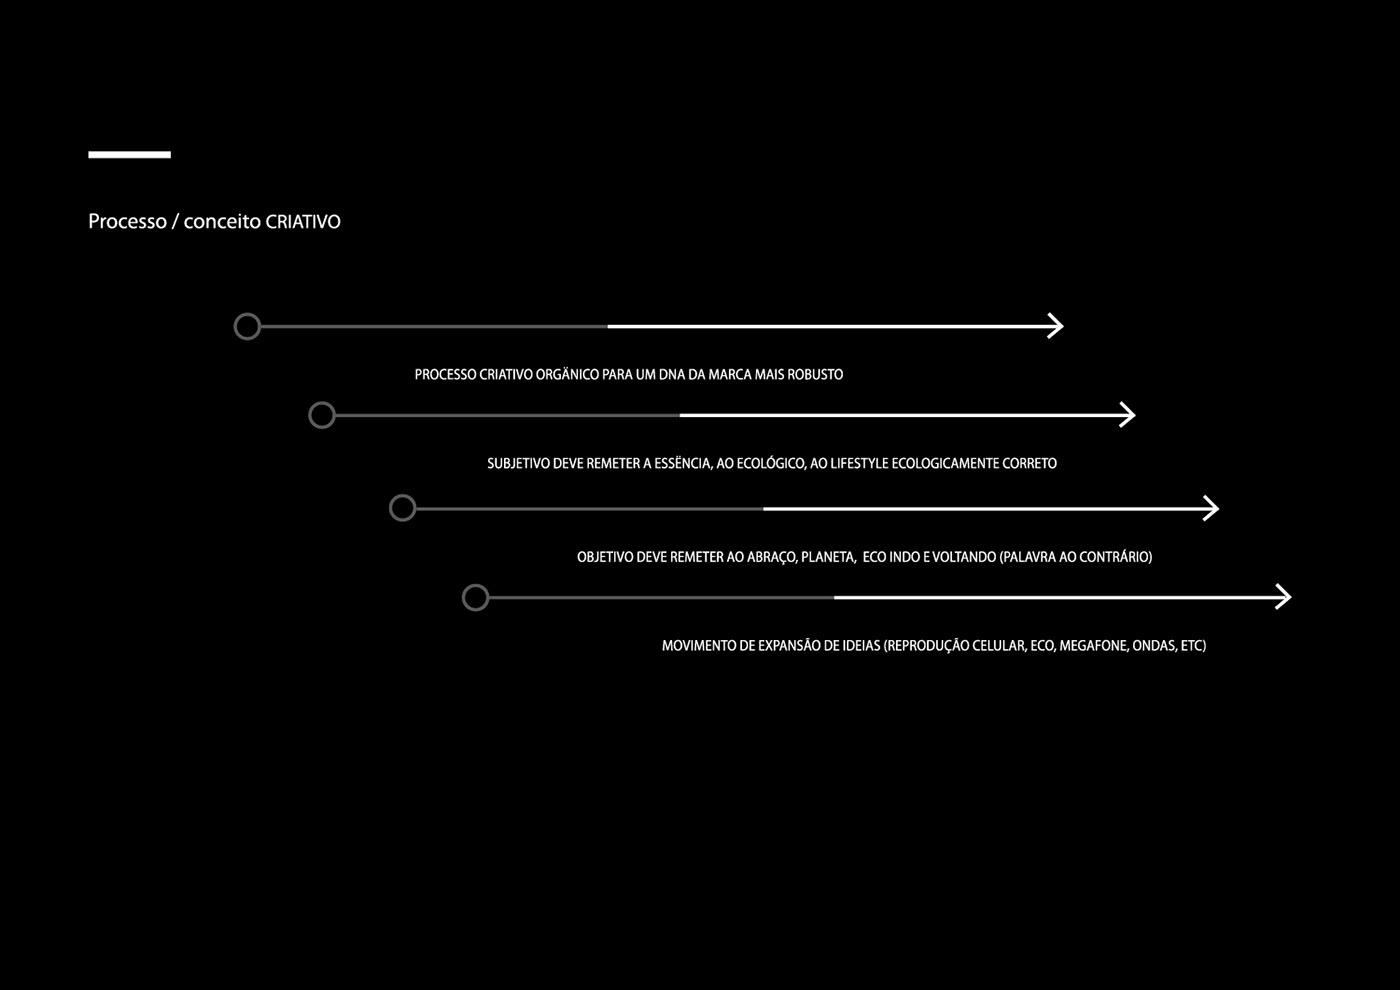 branding ,Logotype,Stationery,Brazil,organic,process,creative,creative process,how to,making of